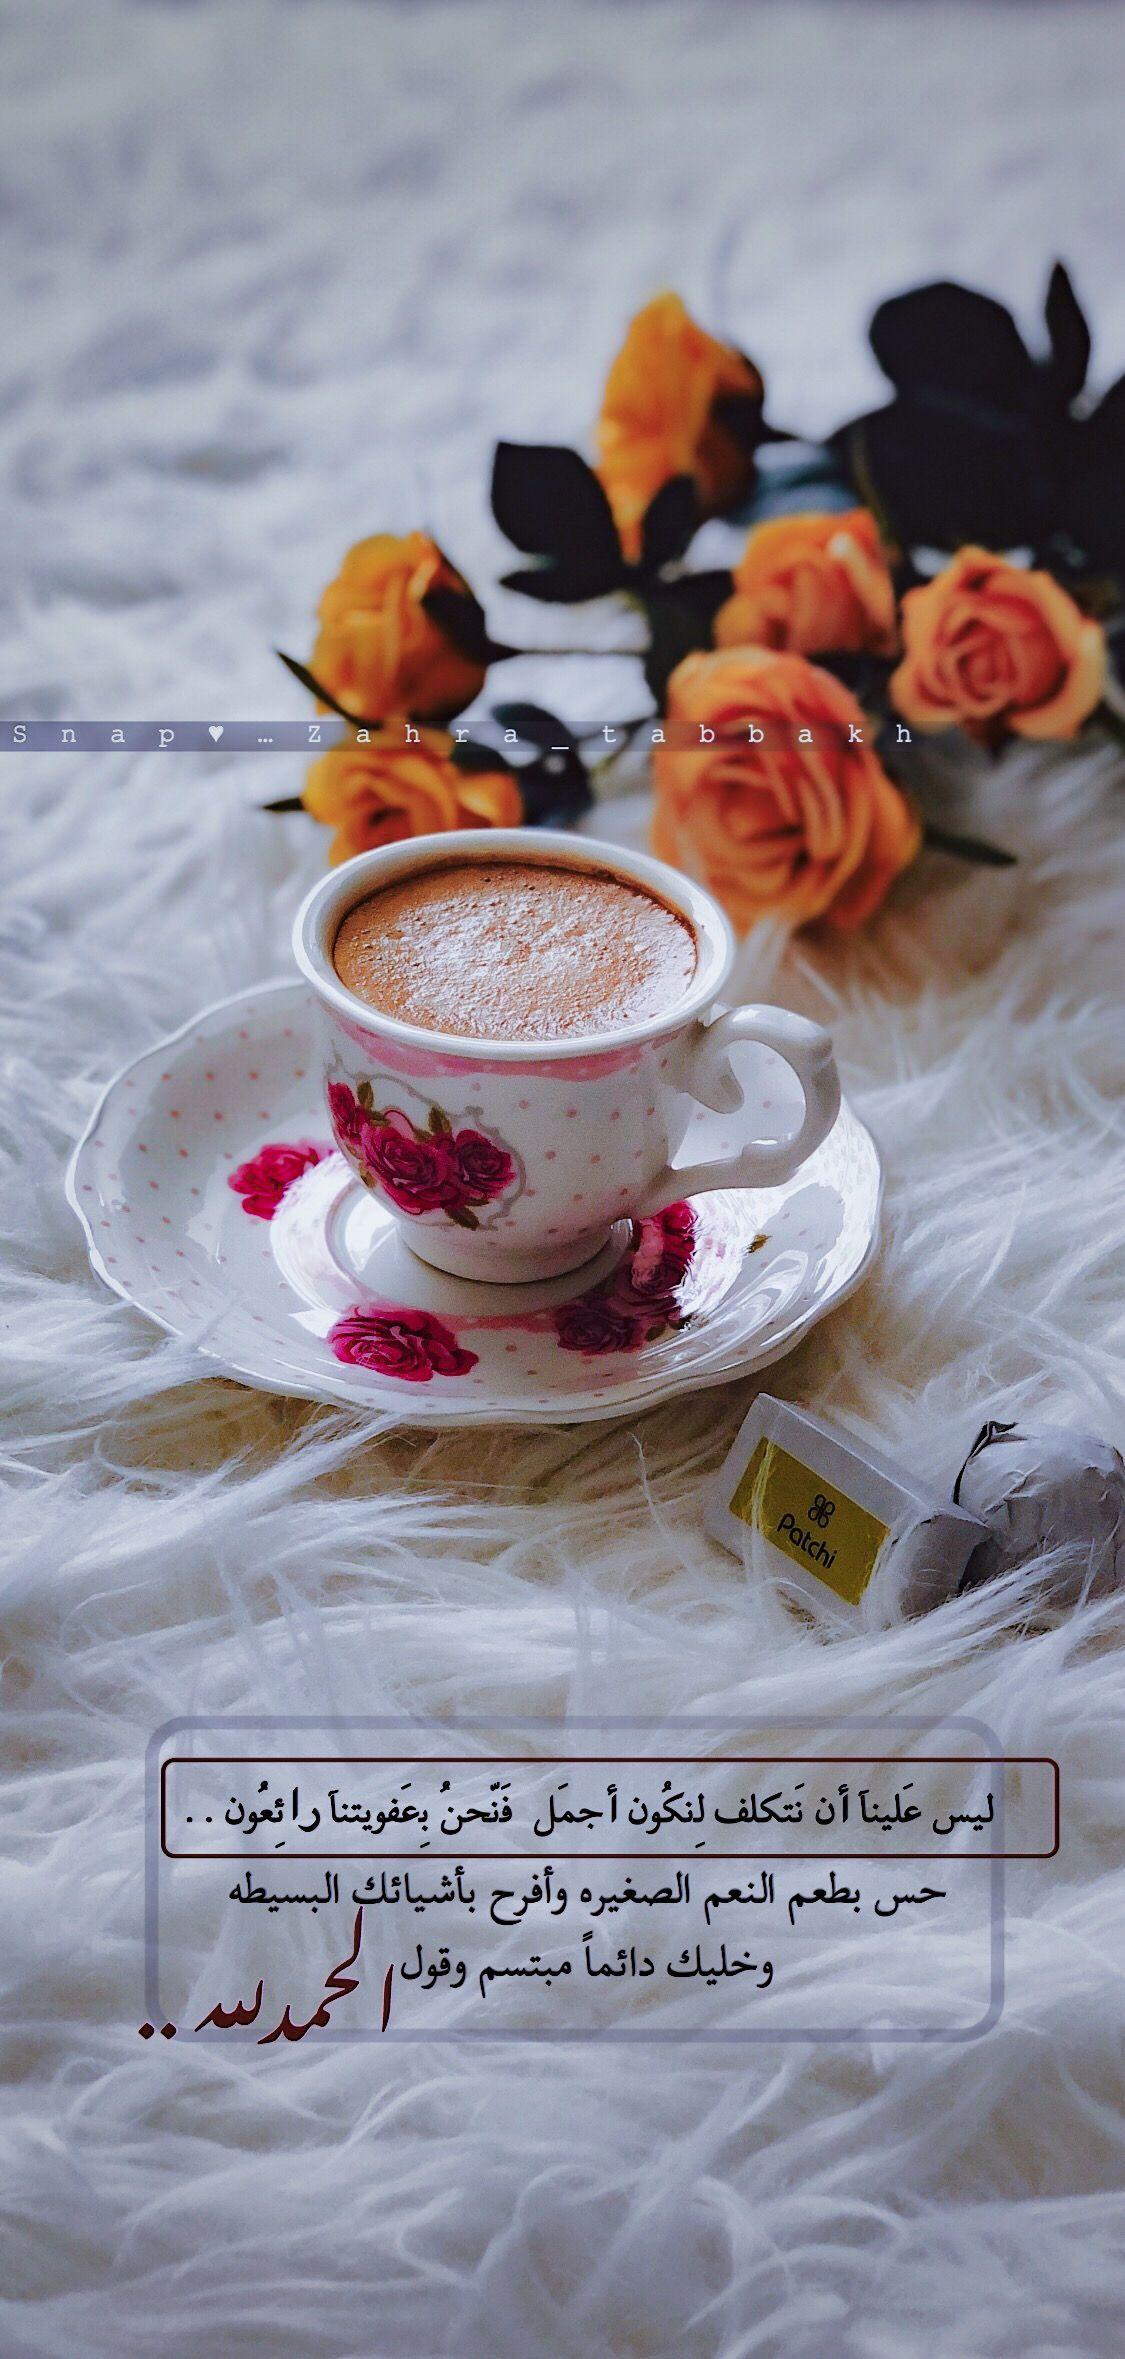 Coffee قهوة قهوتي صباح رمزيات هدوء صباحات Tea Cups Tea Tableware